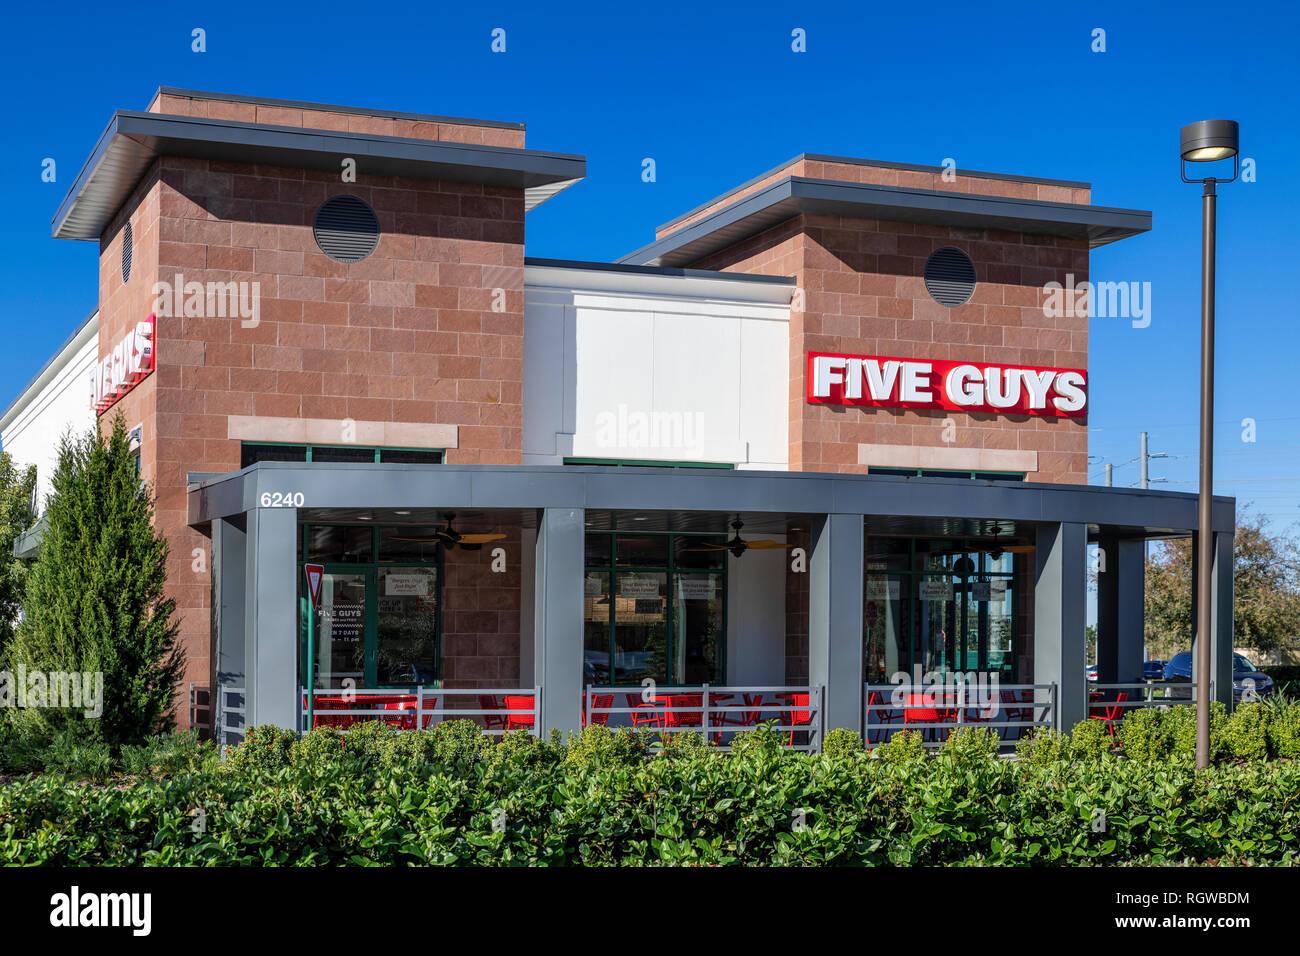 Fünf Jungs schnell zwangloses Restaurant. Stockbild